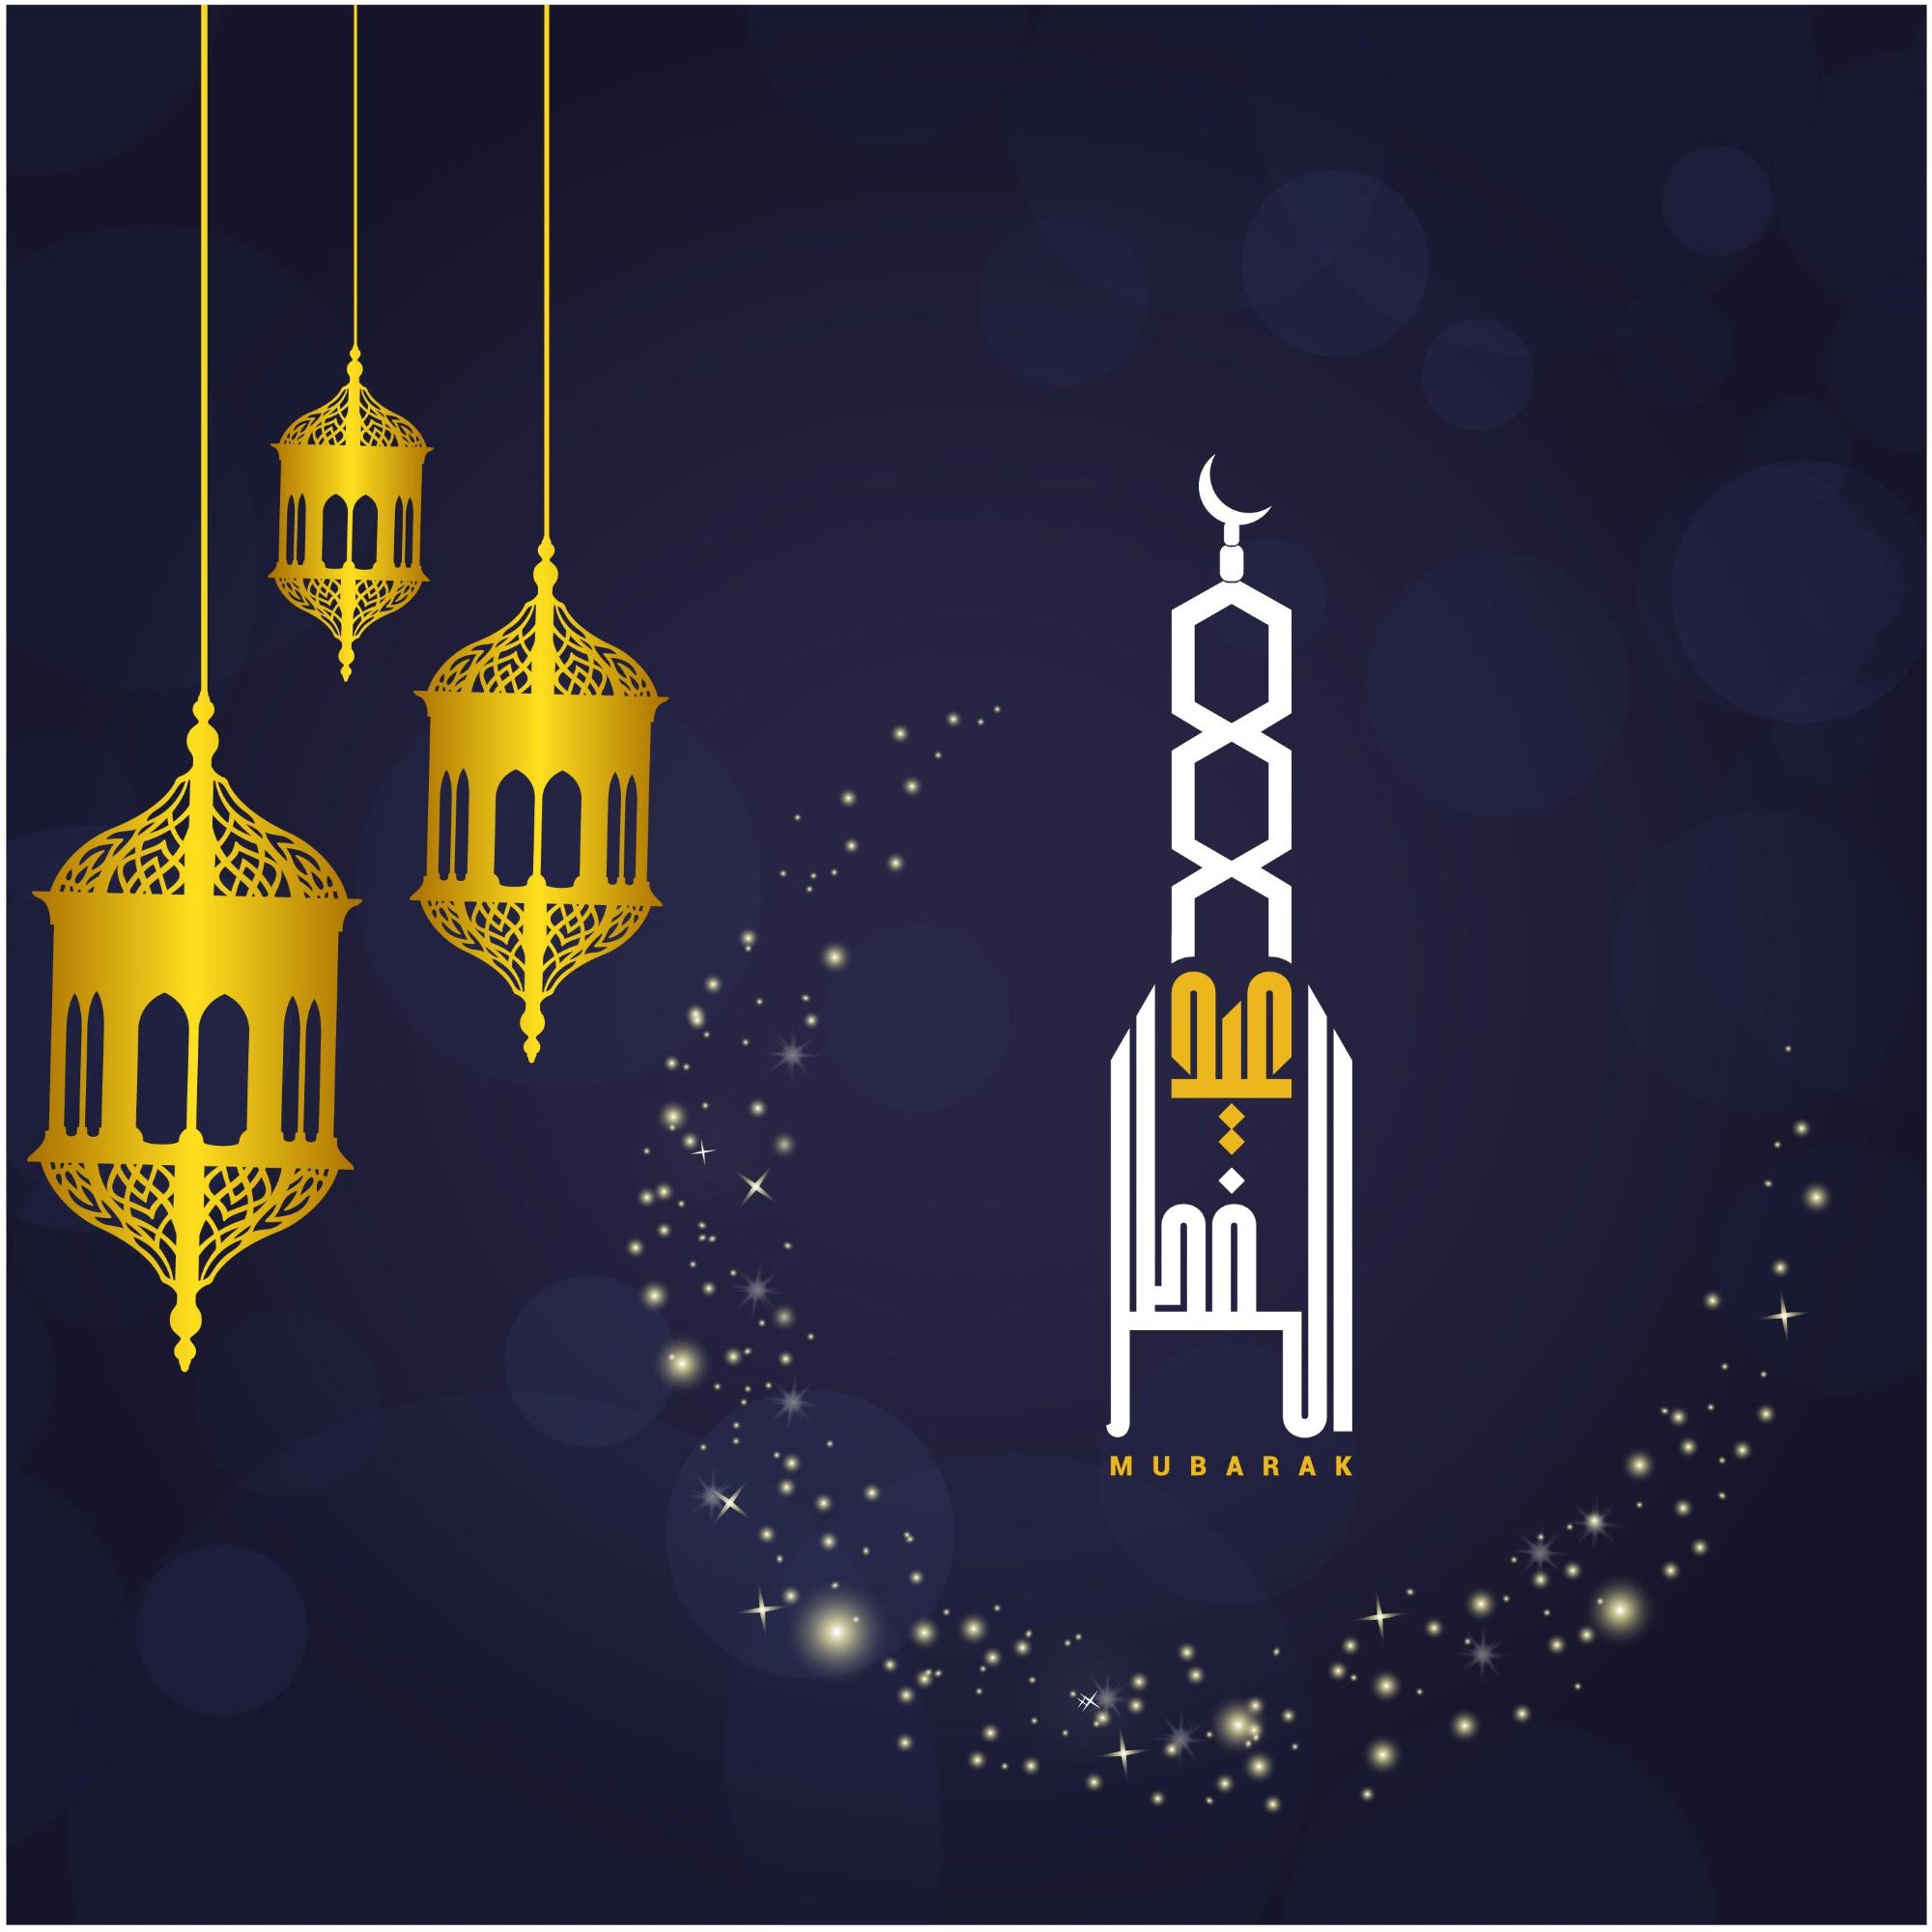 Desertroseeid Mubarak Greetings Wallpaper Design Vector Http